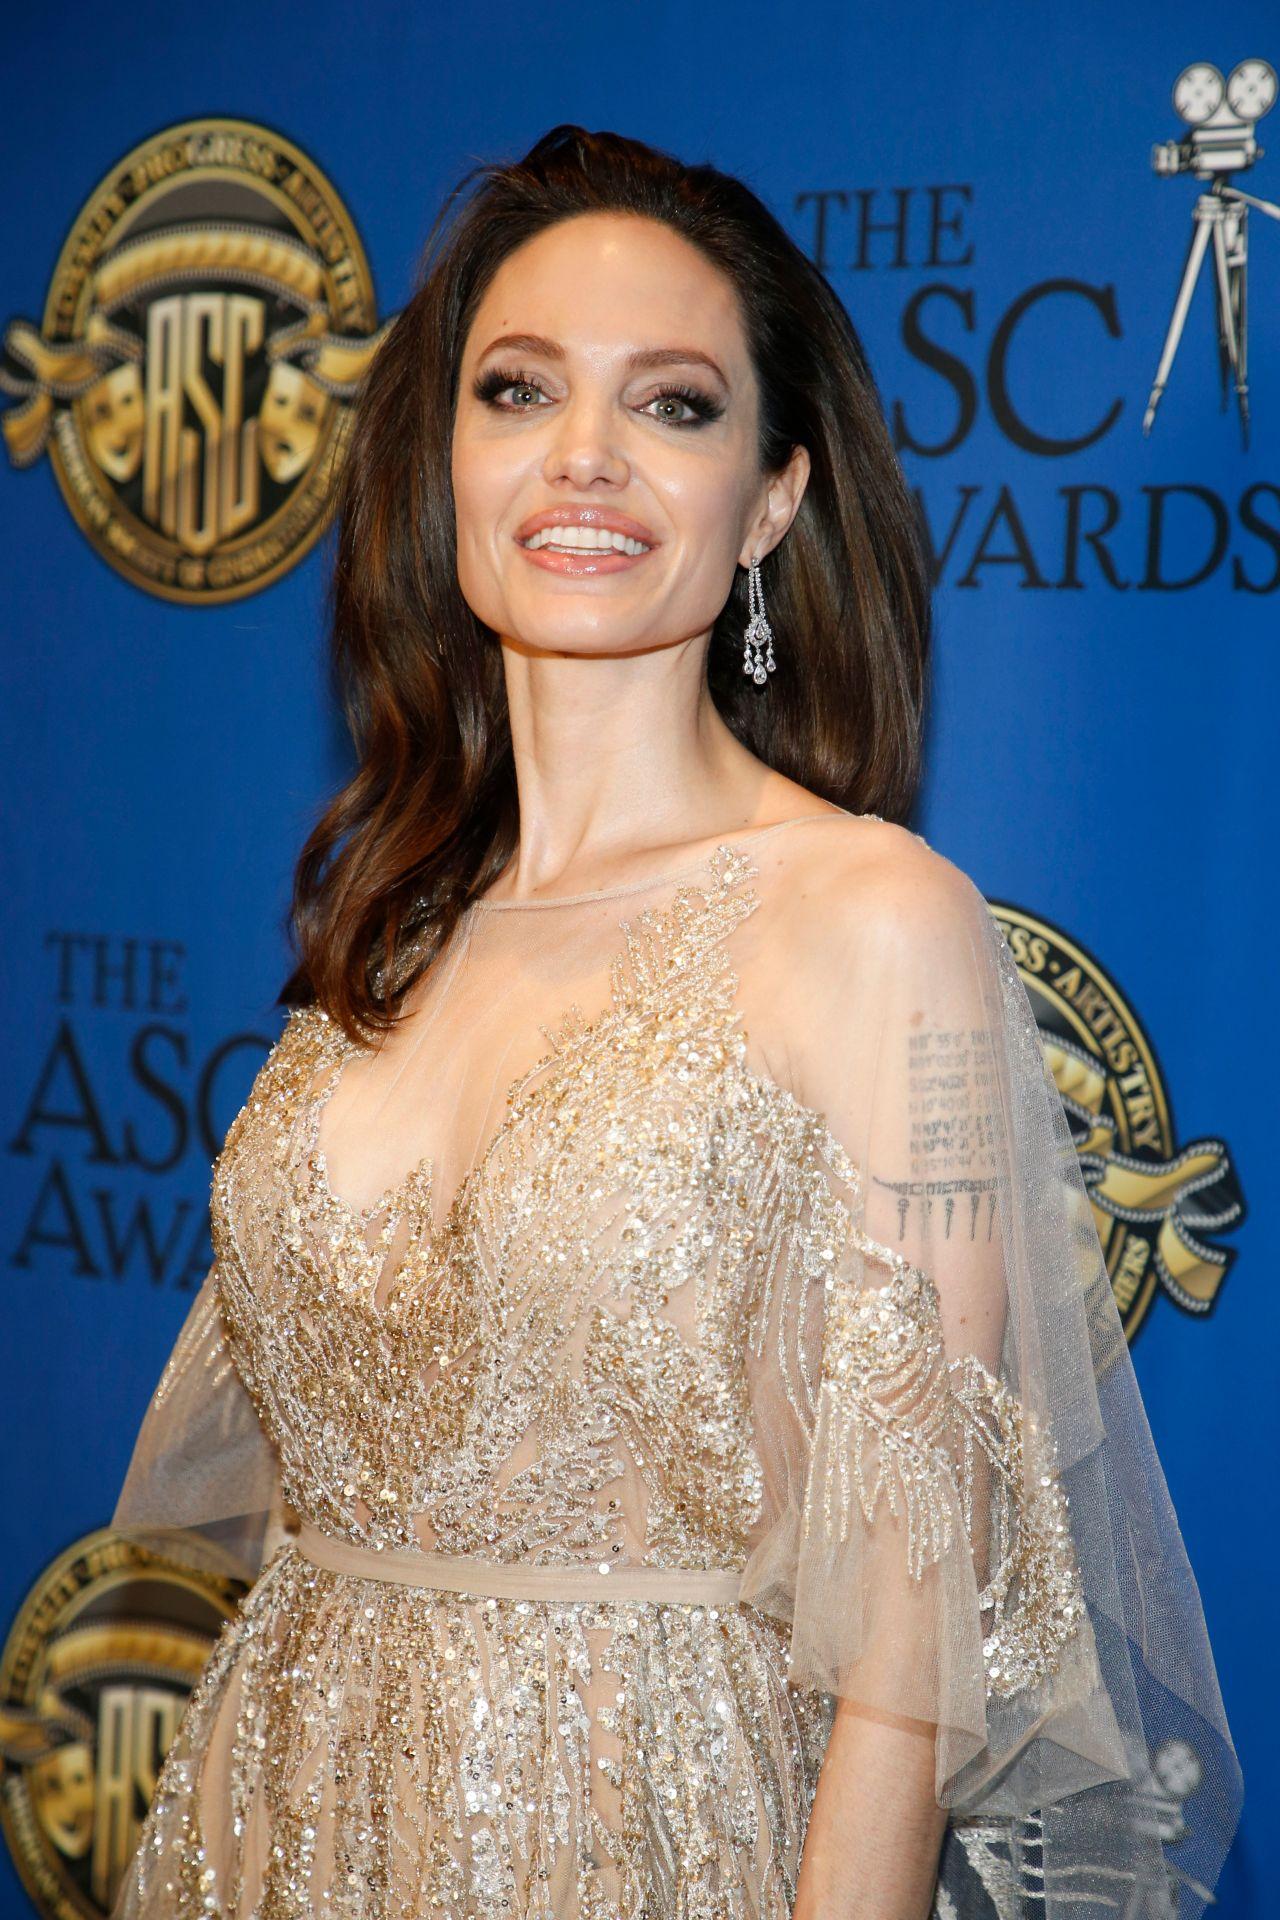 http://celebmafia.com/wp-content/uploads/2018/02/angelina-jolie-2018-asc-awards-in-la-9.jpg